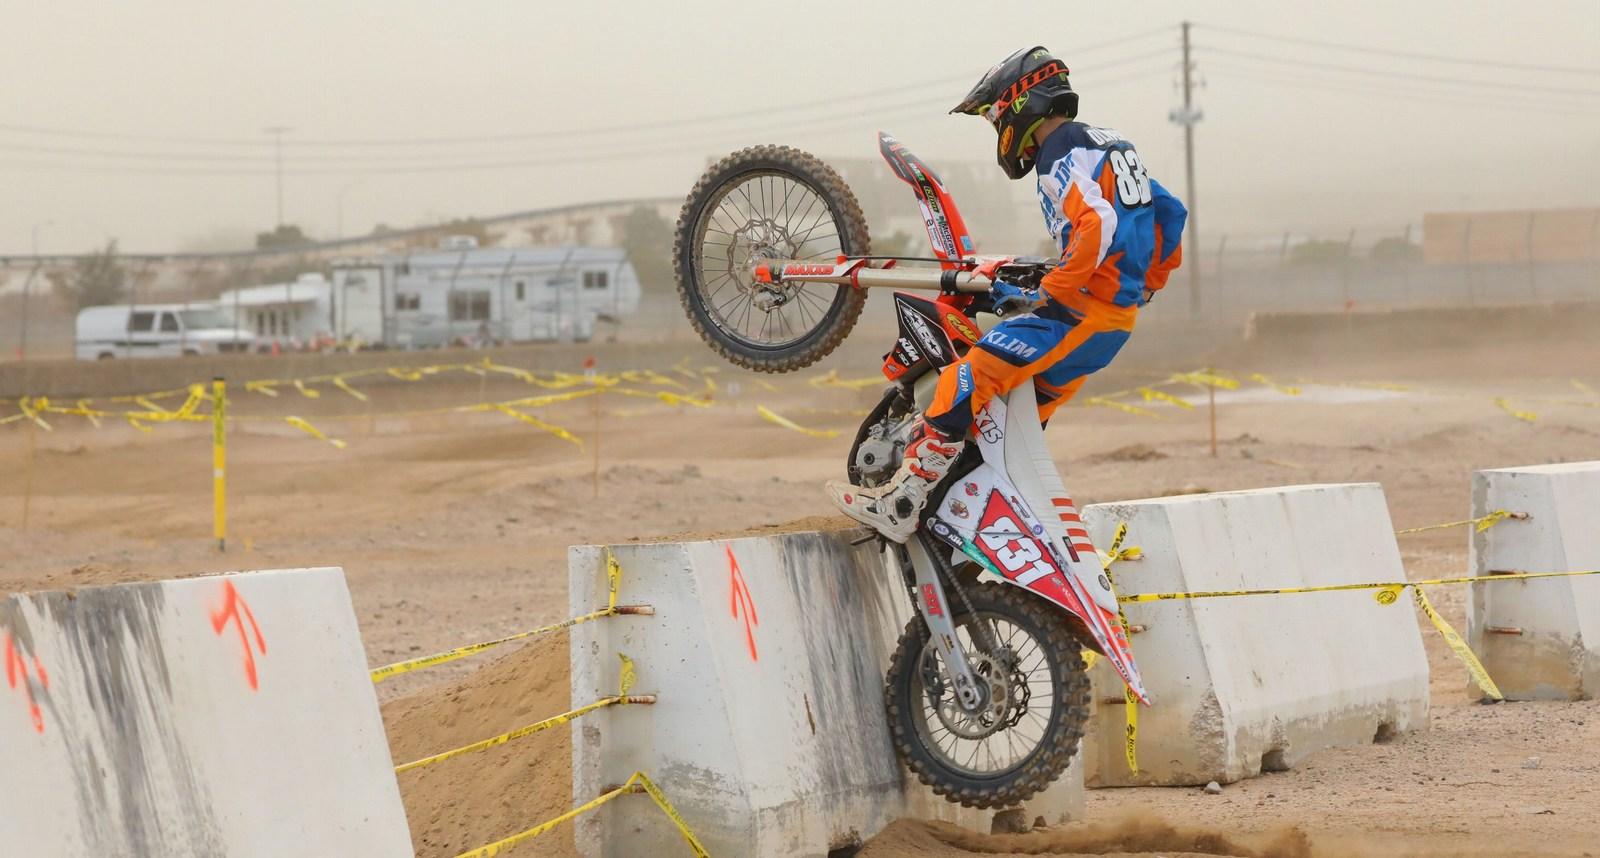 2020-01-mateo-oliveira-krail-bike-worcs-racing